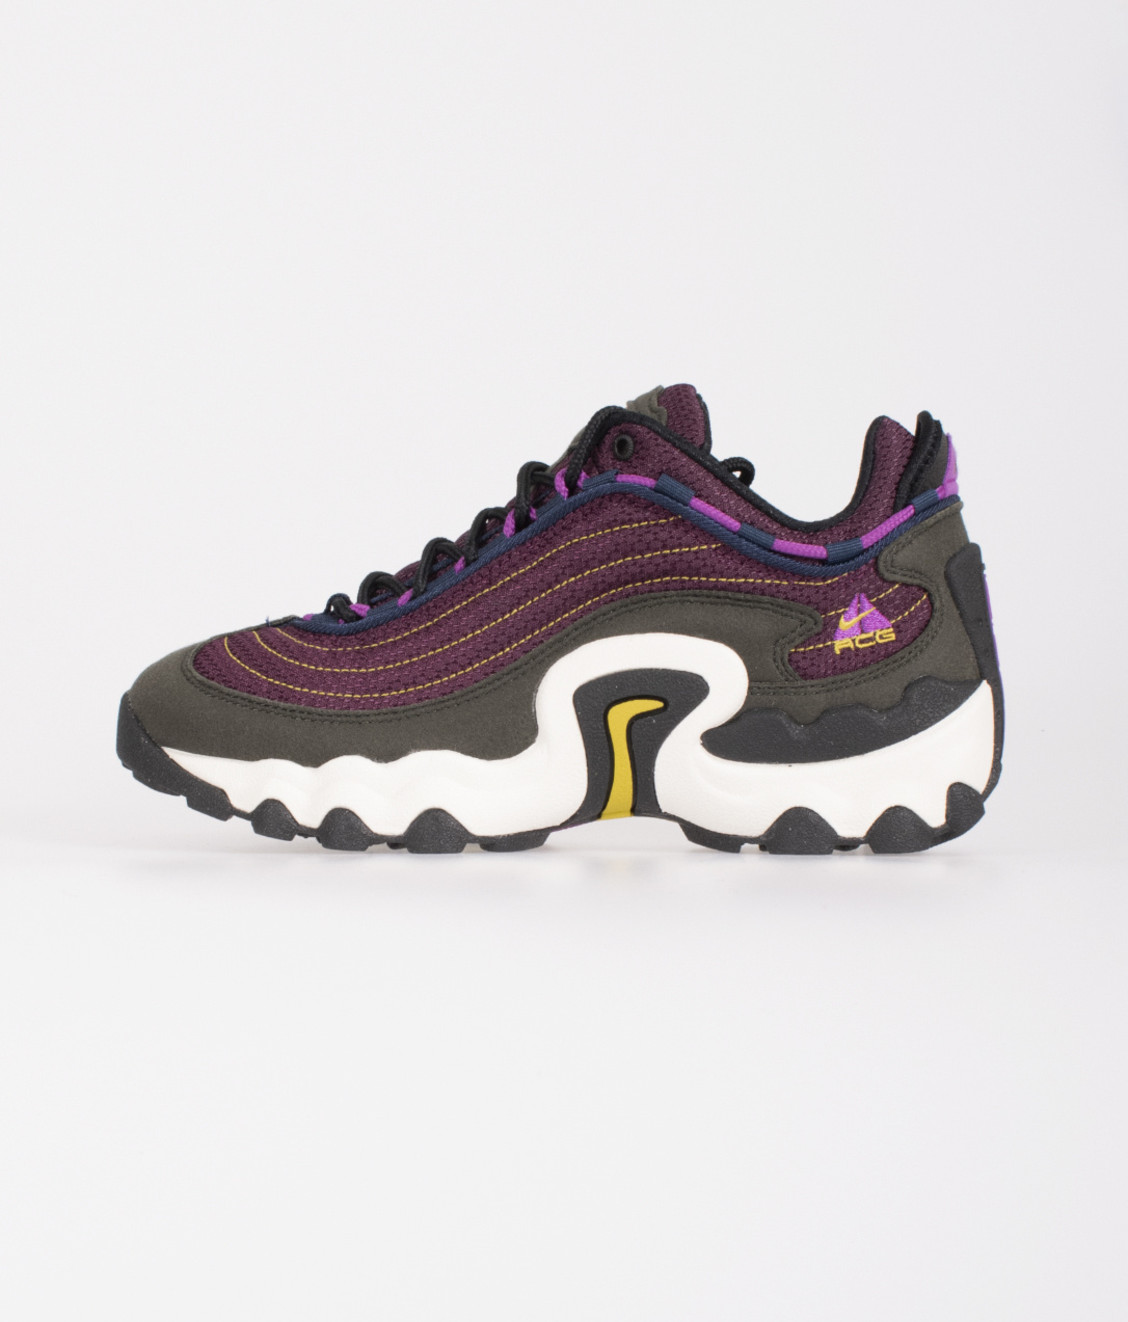 Nike Nike ACG Air Skarn Sequoia Vivid Purple